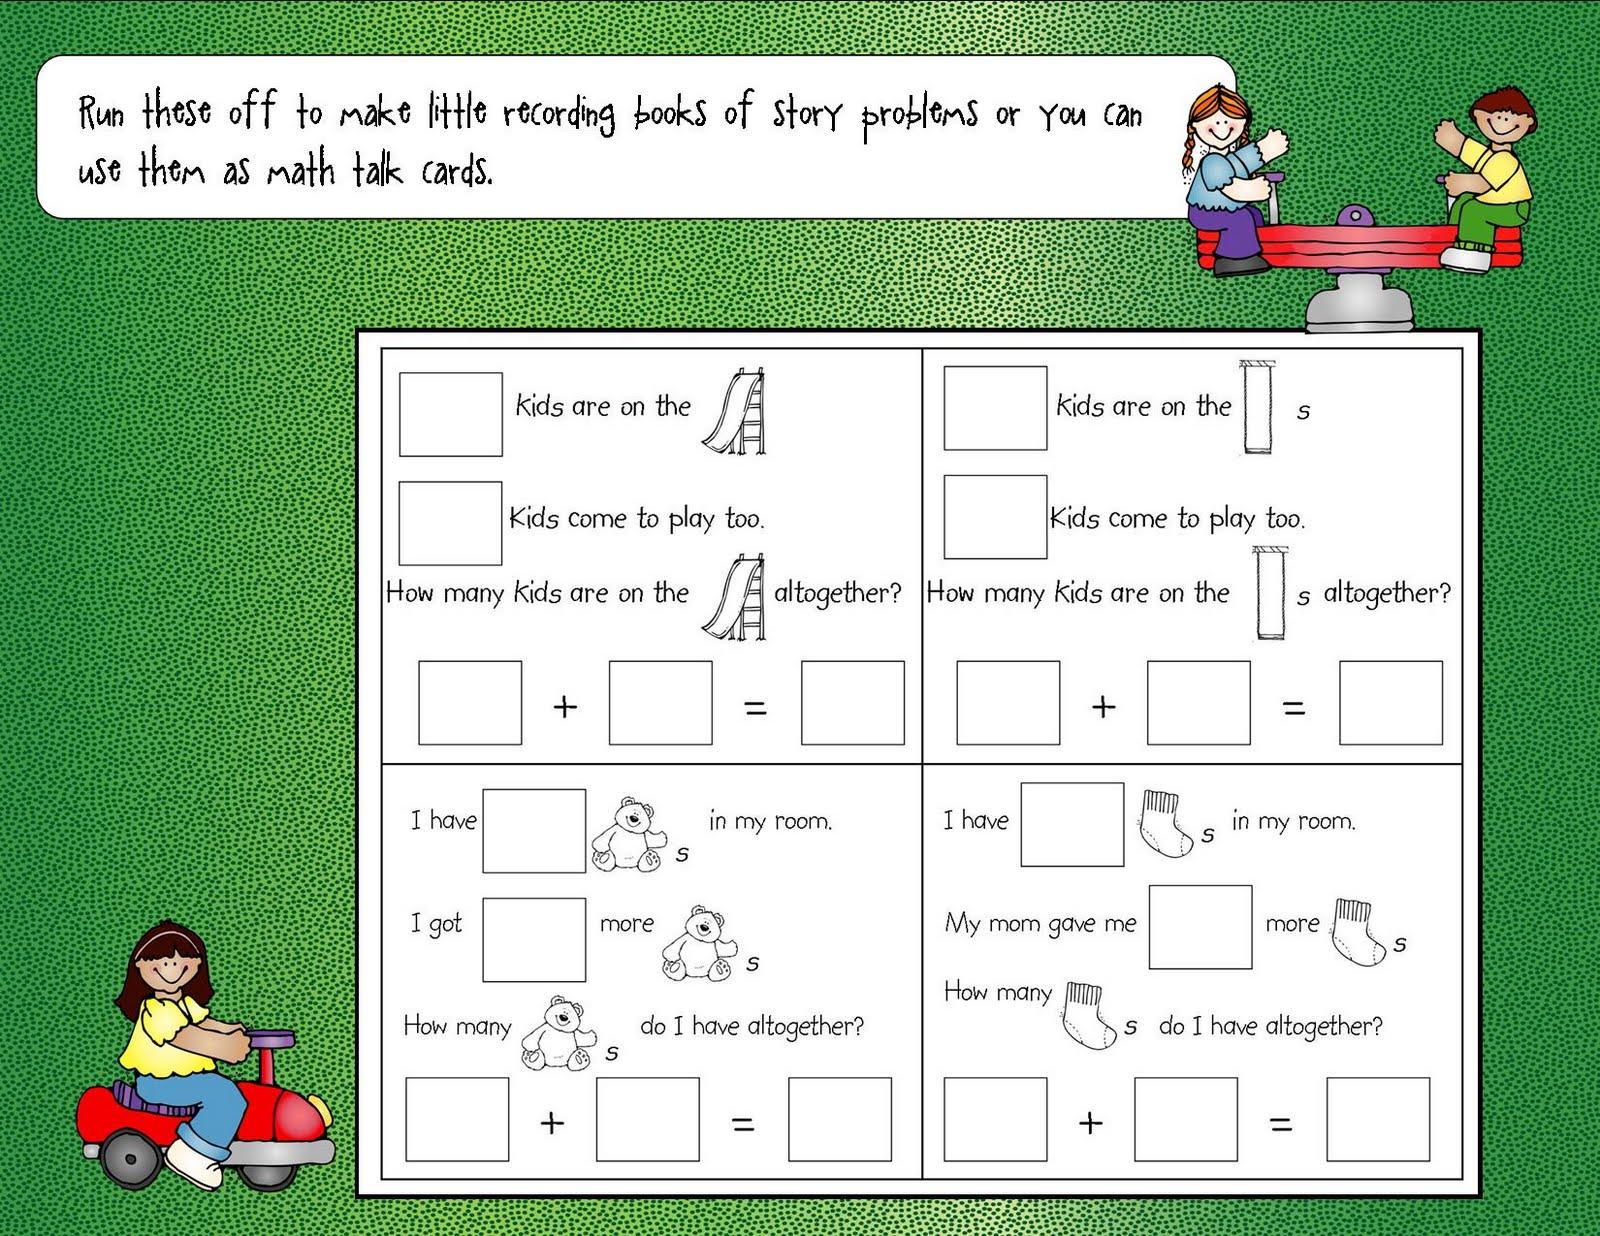 Kindergarten Crayons Even Kinder Kids Can Do This Adding